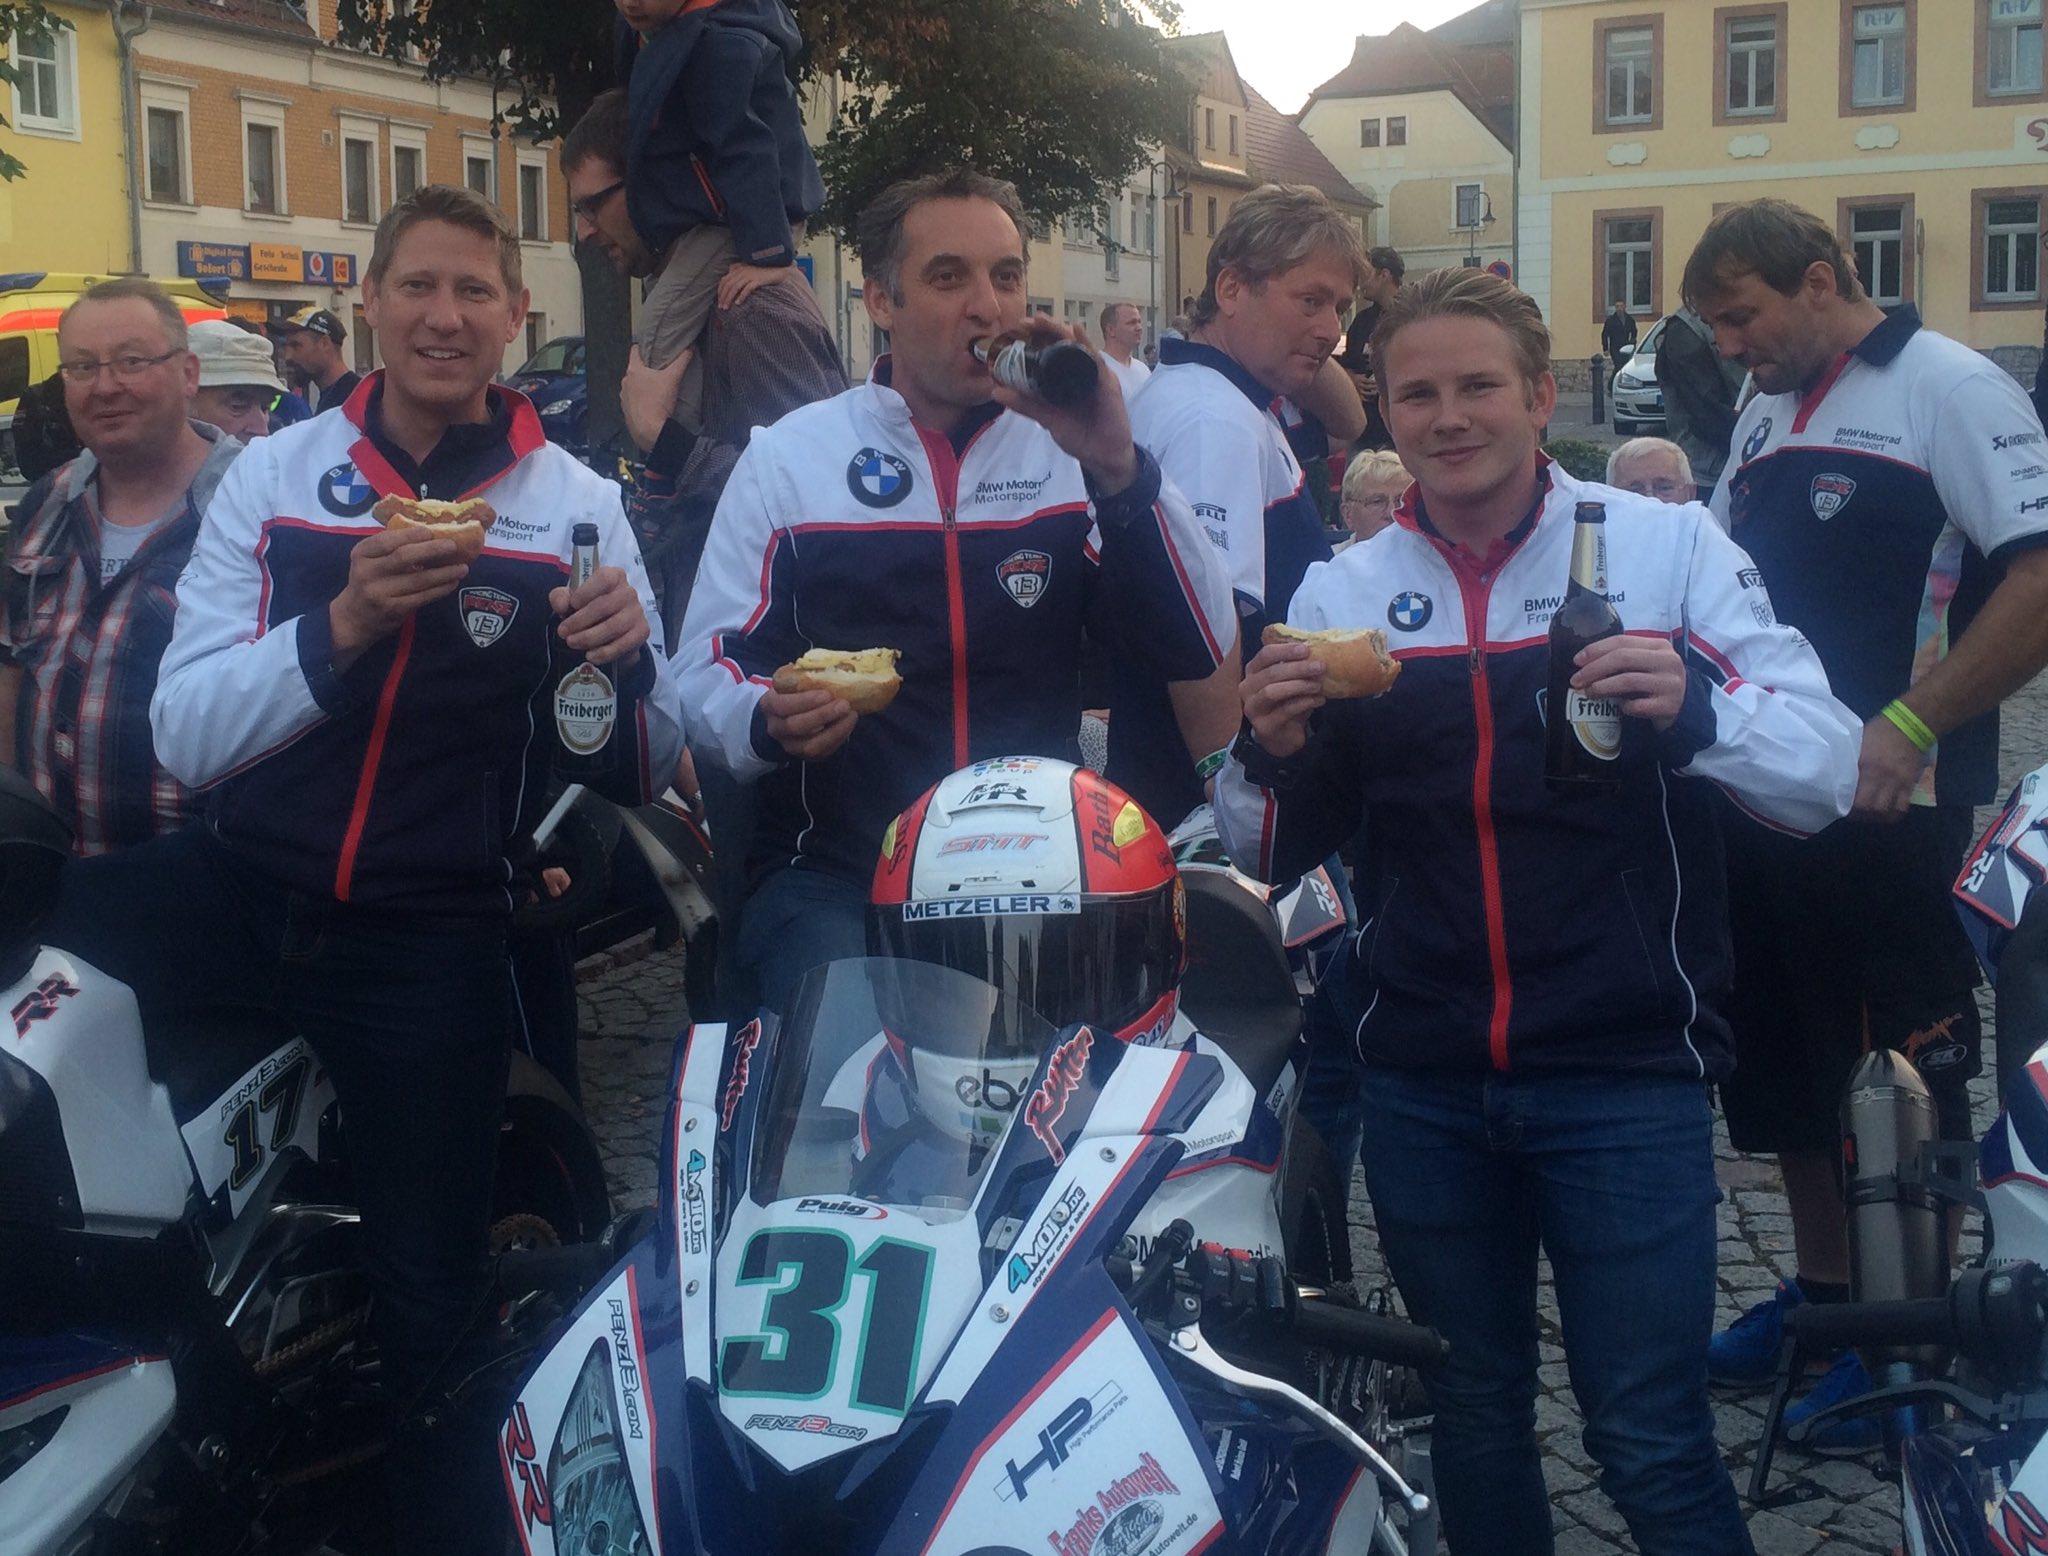 [Road Racing] IRRC Frohburger  2016   CtEIS-tXYAAxUqC